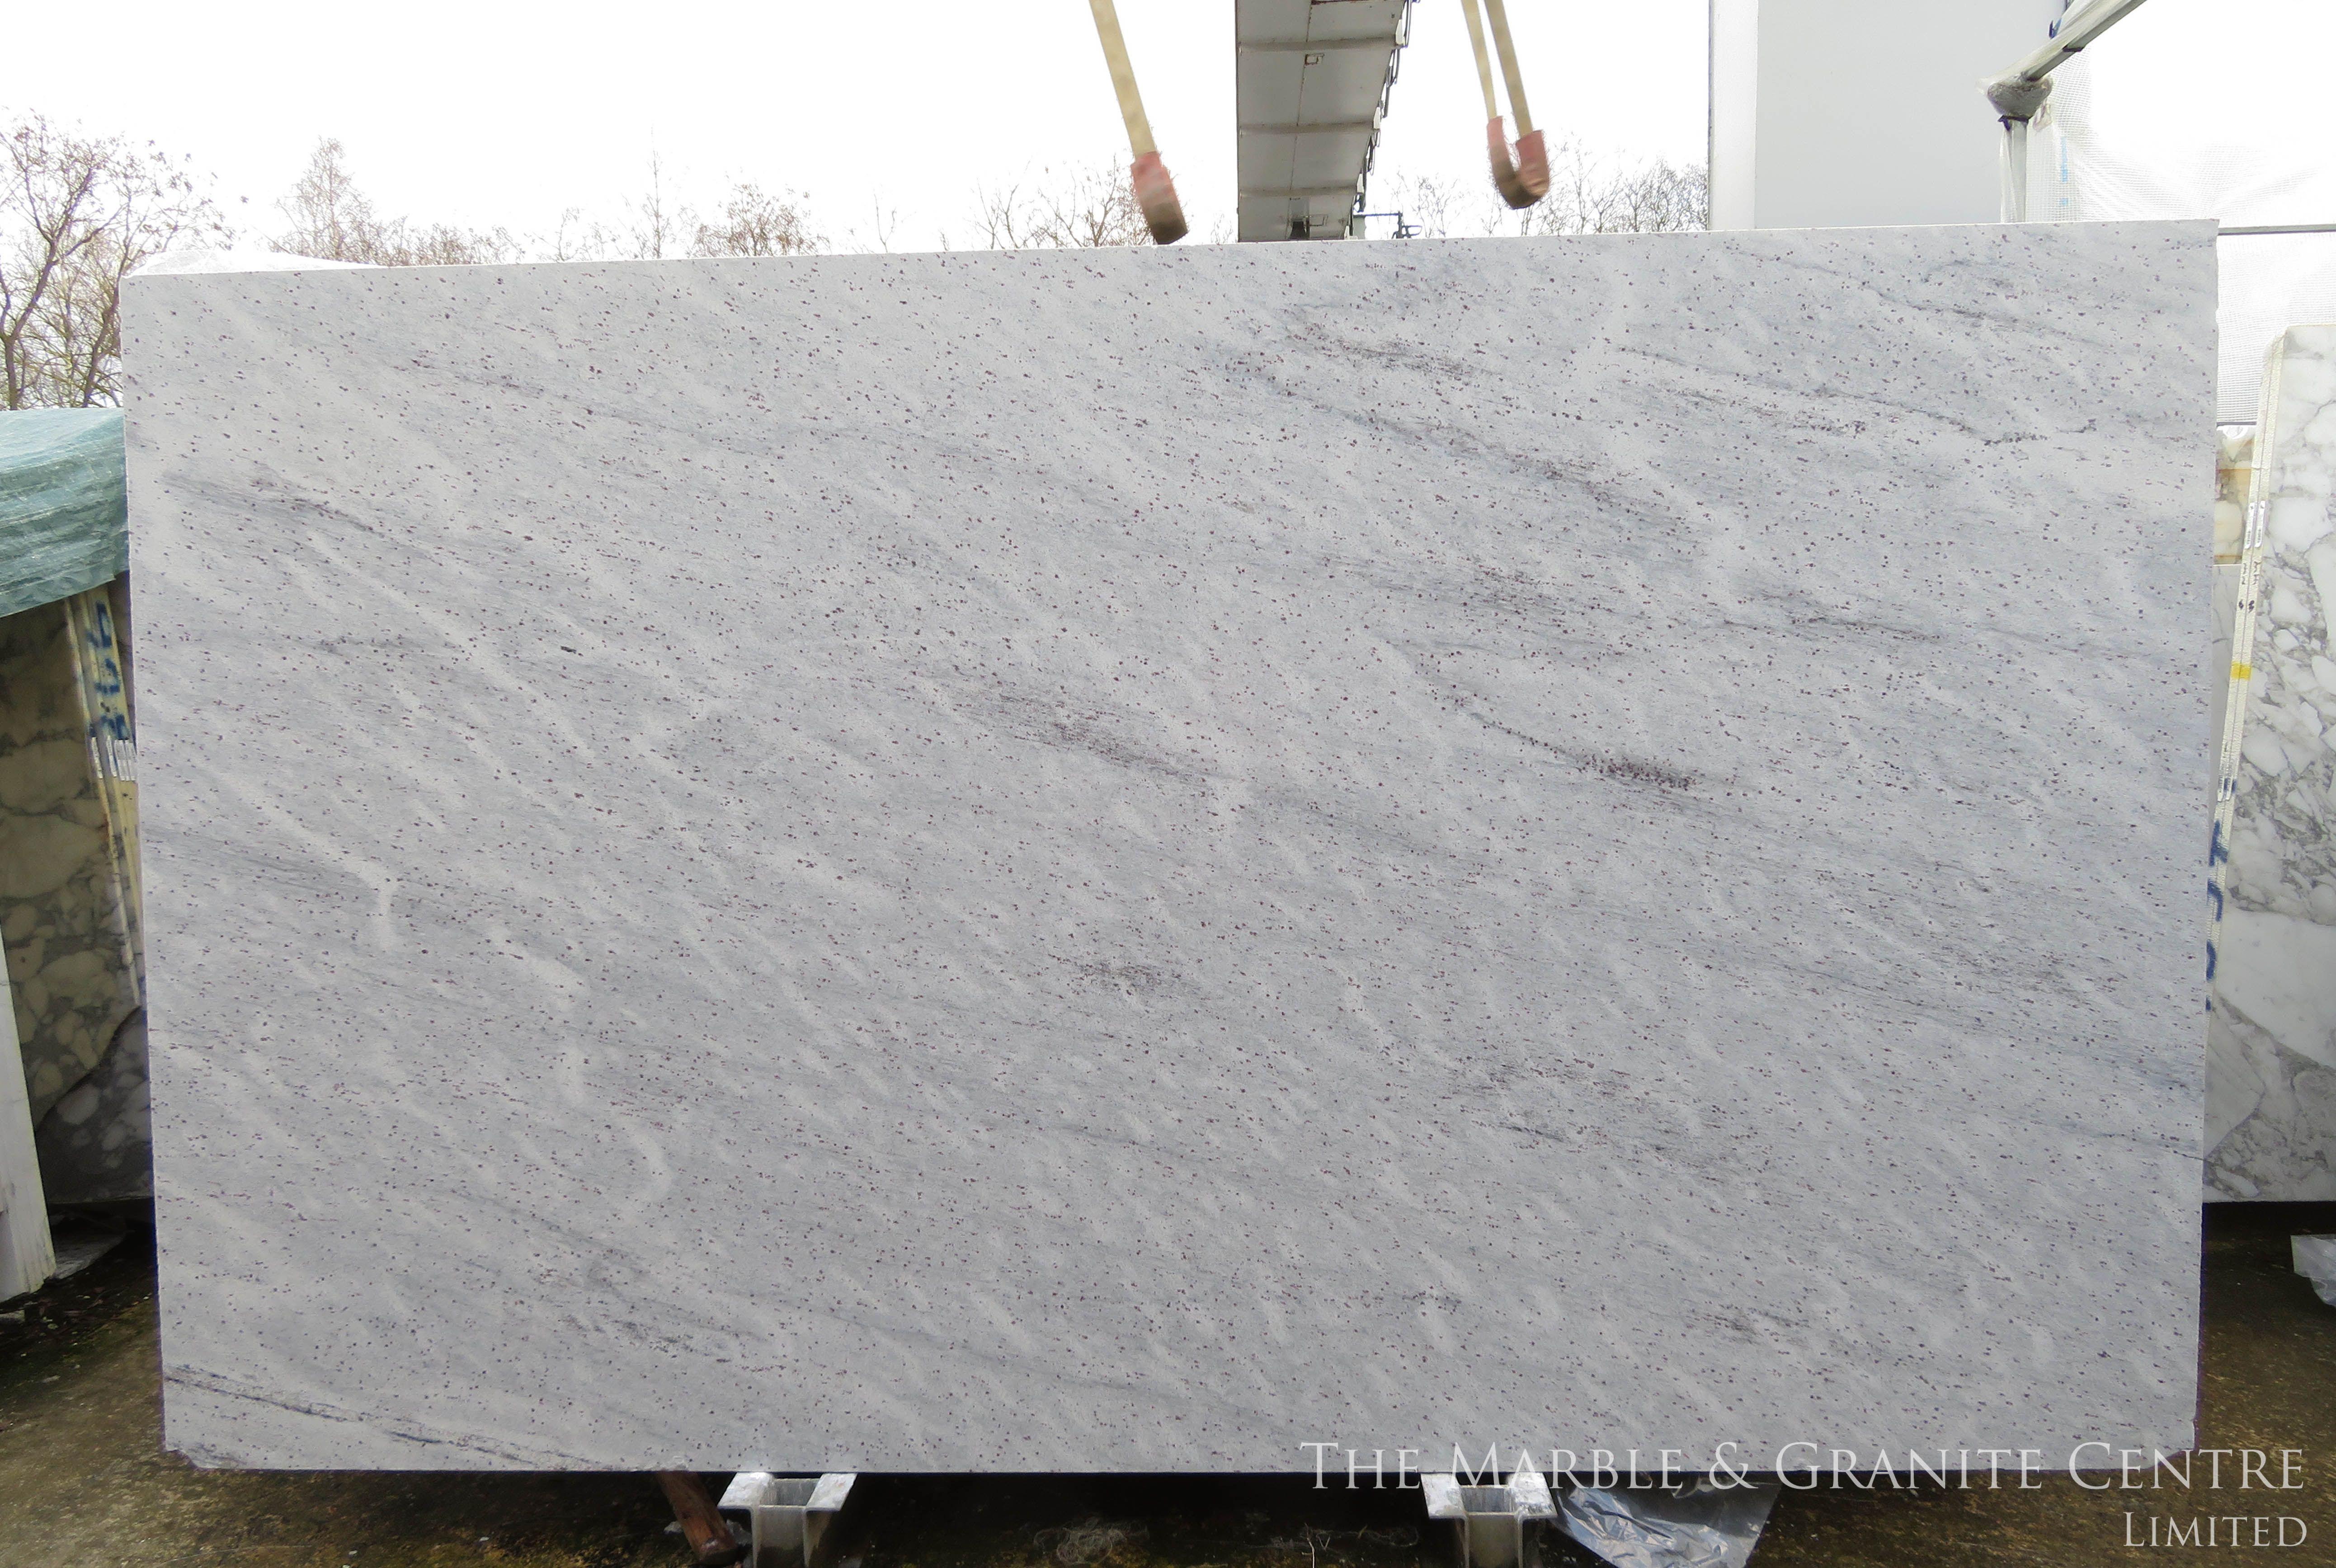 Granite River White Granite, Polished 30 Mm [2160]